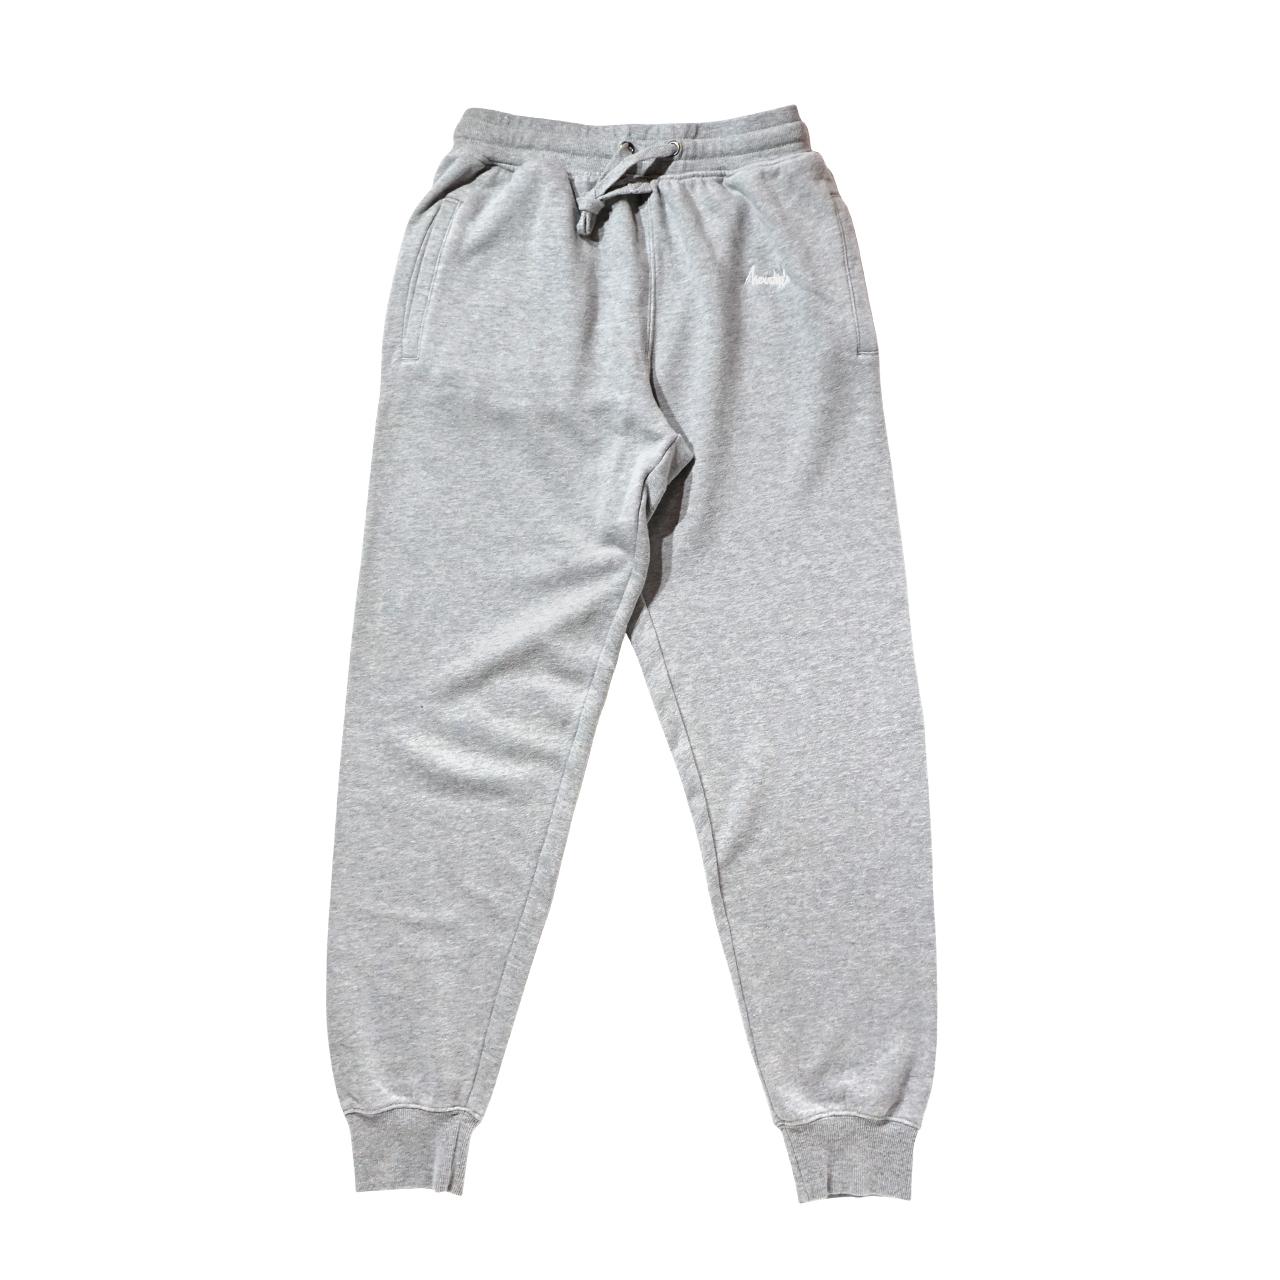 BASIC LOGO 019 light sweat pants <Gray×White> - 画像1